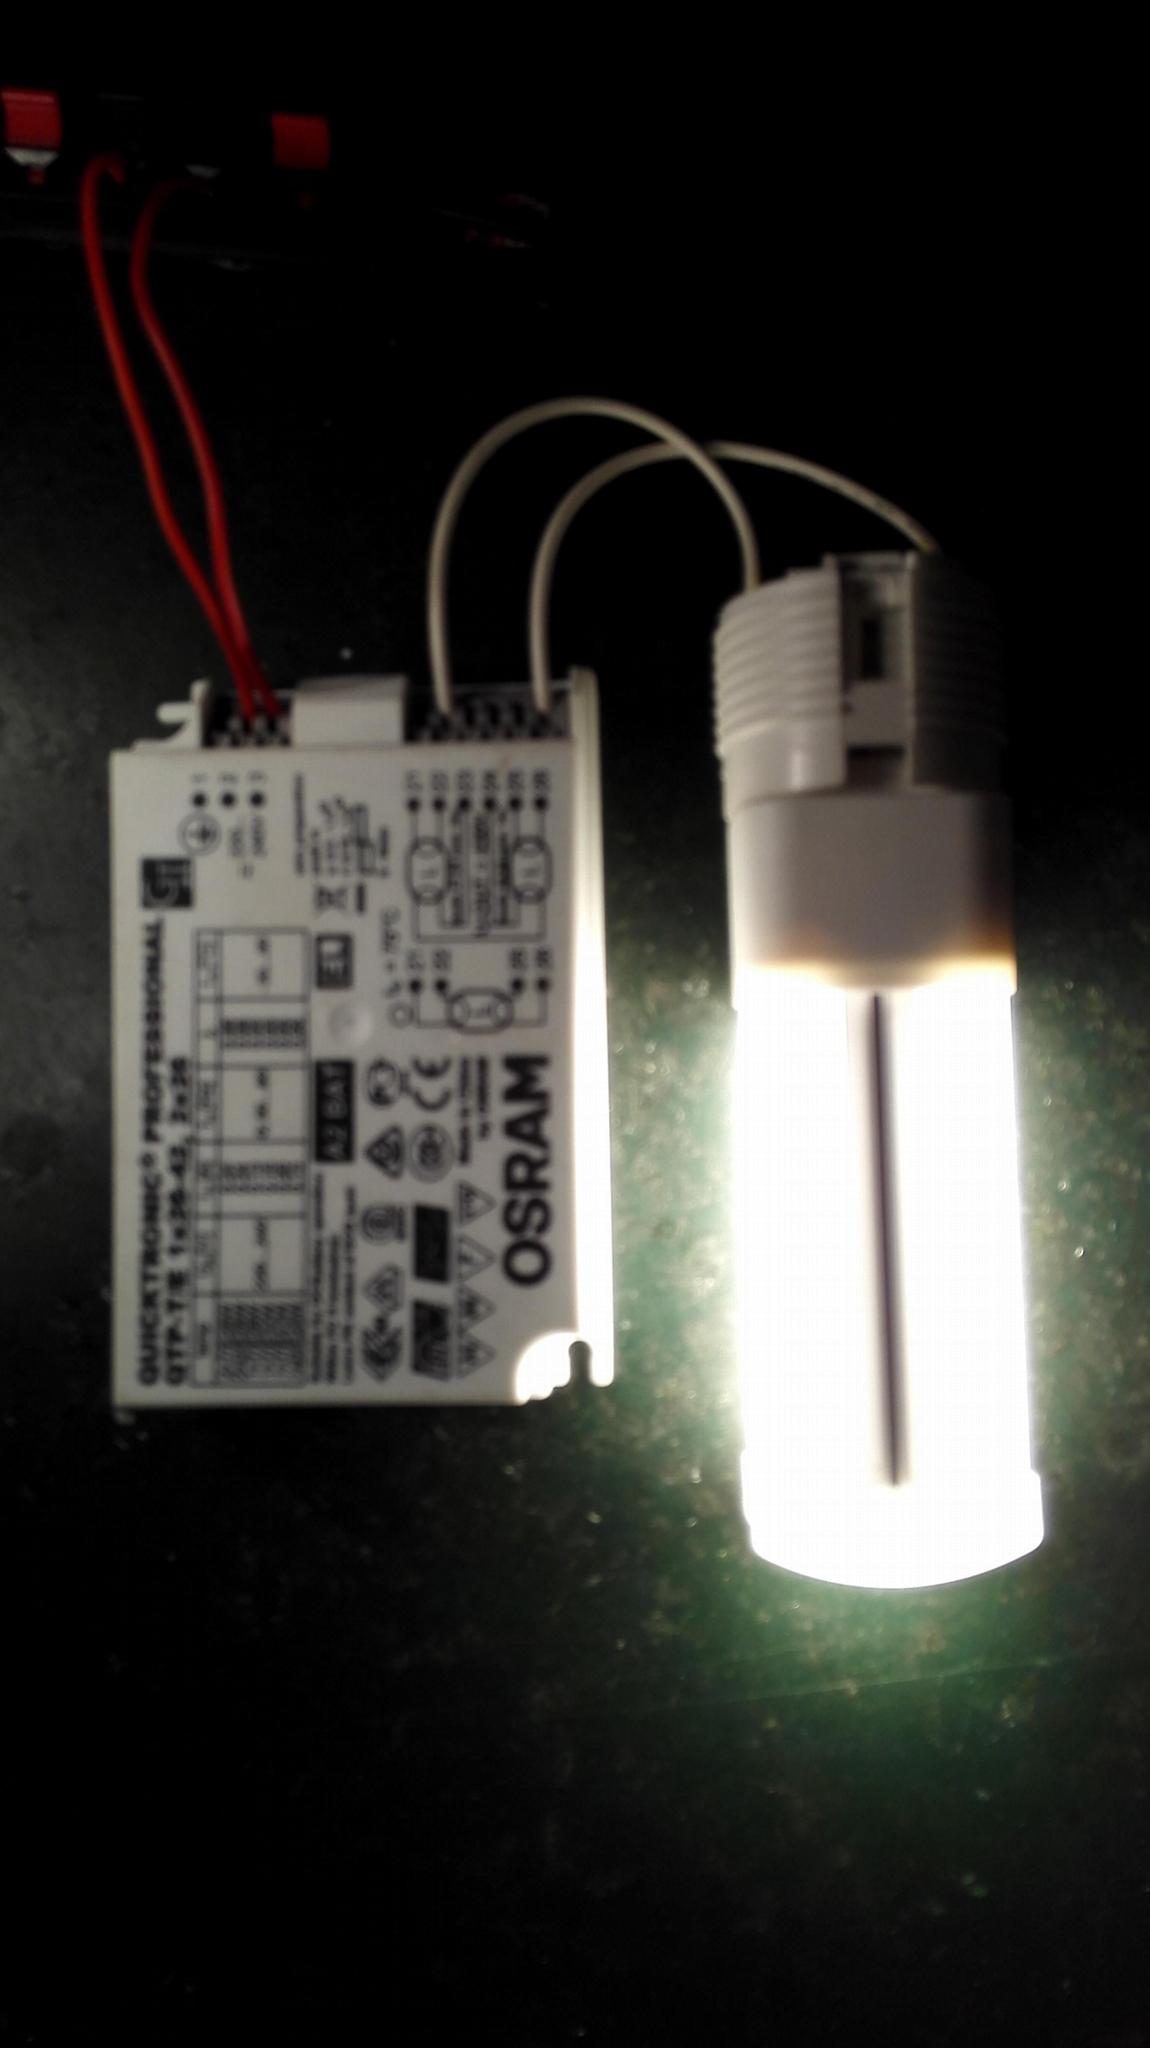 2G10兼容镇电子流器横插灯管7W 4